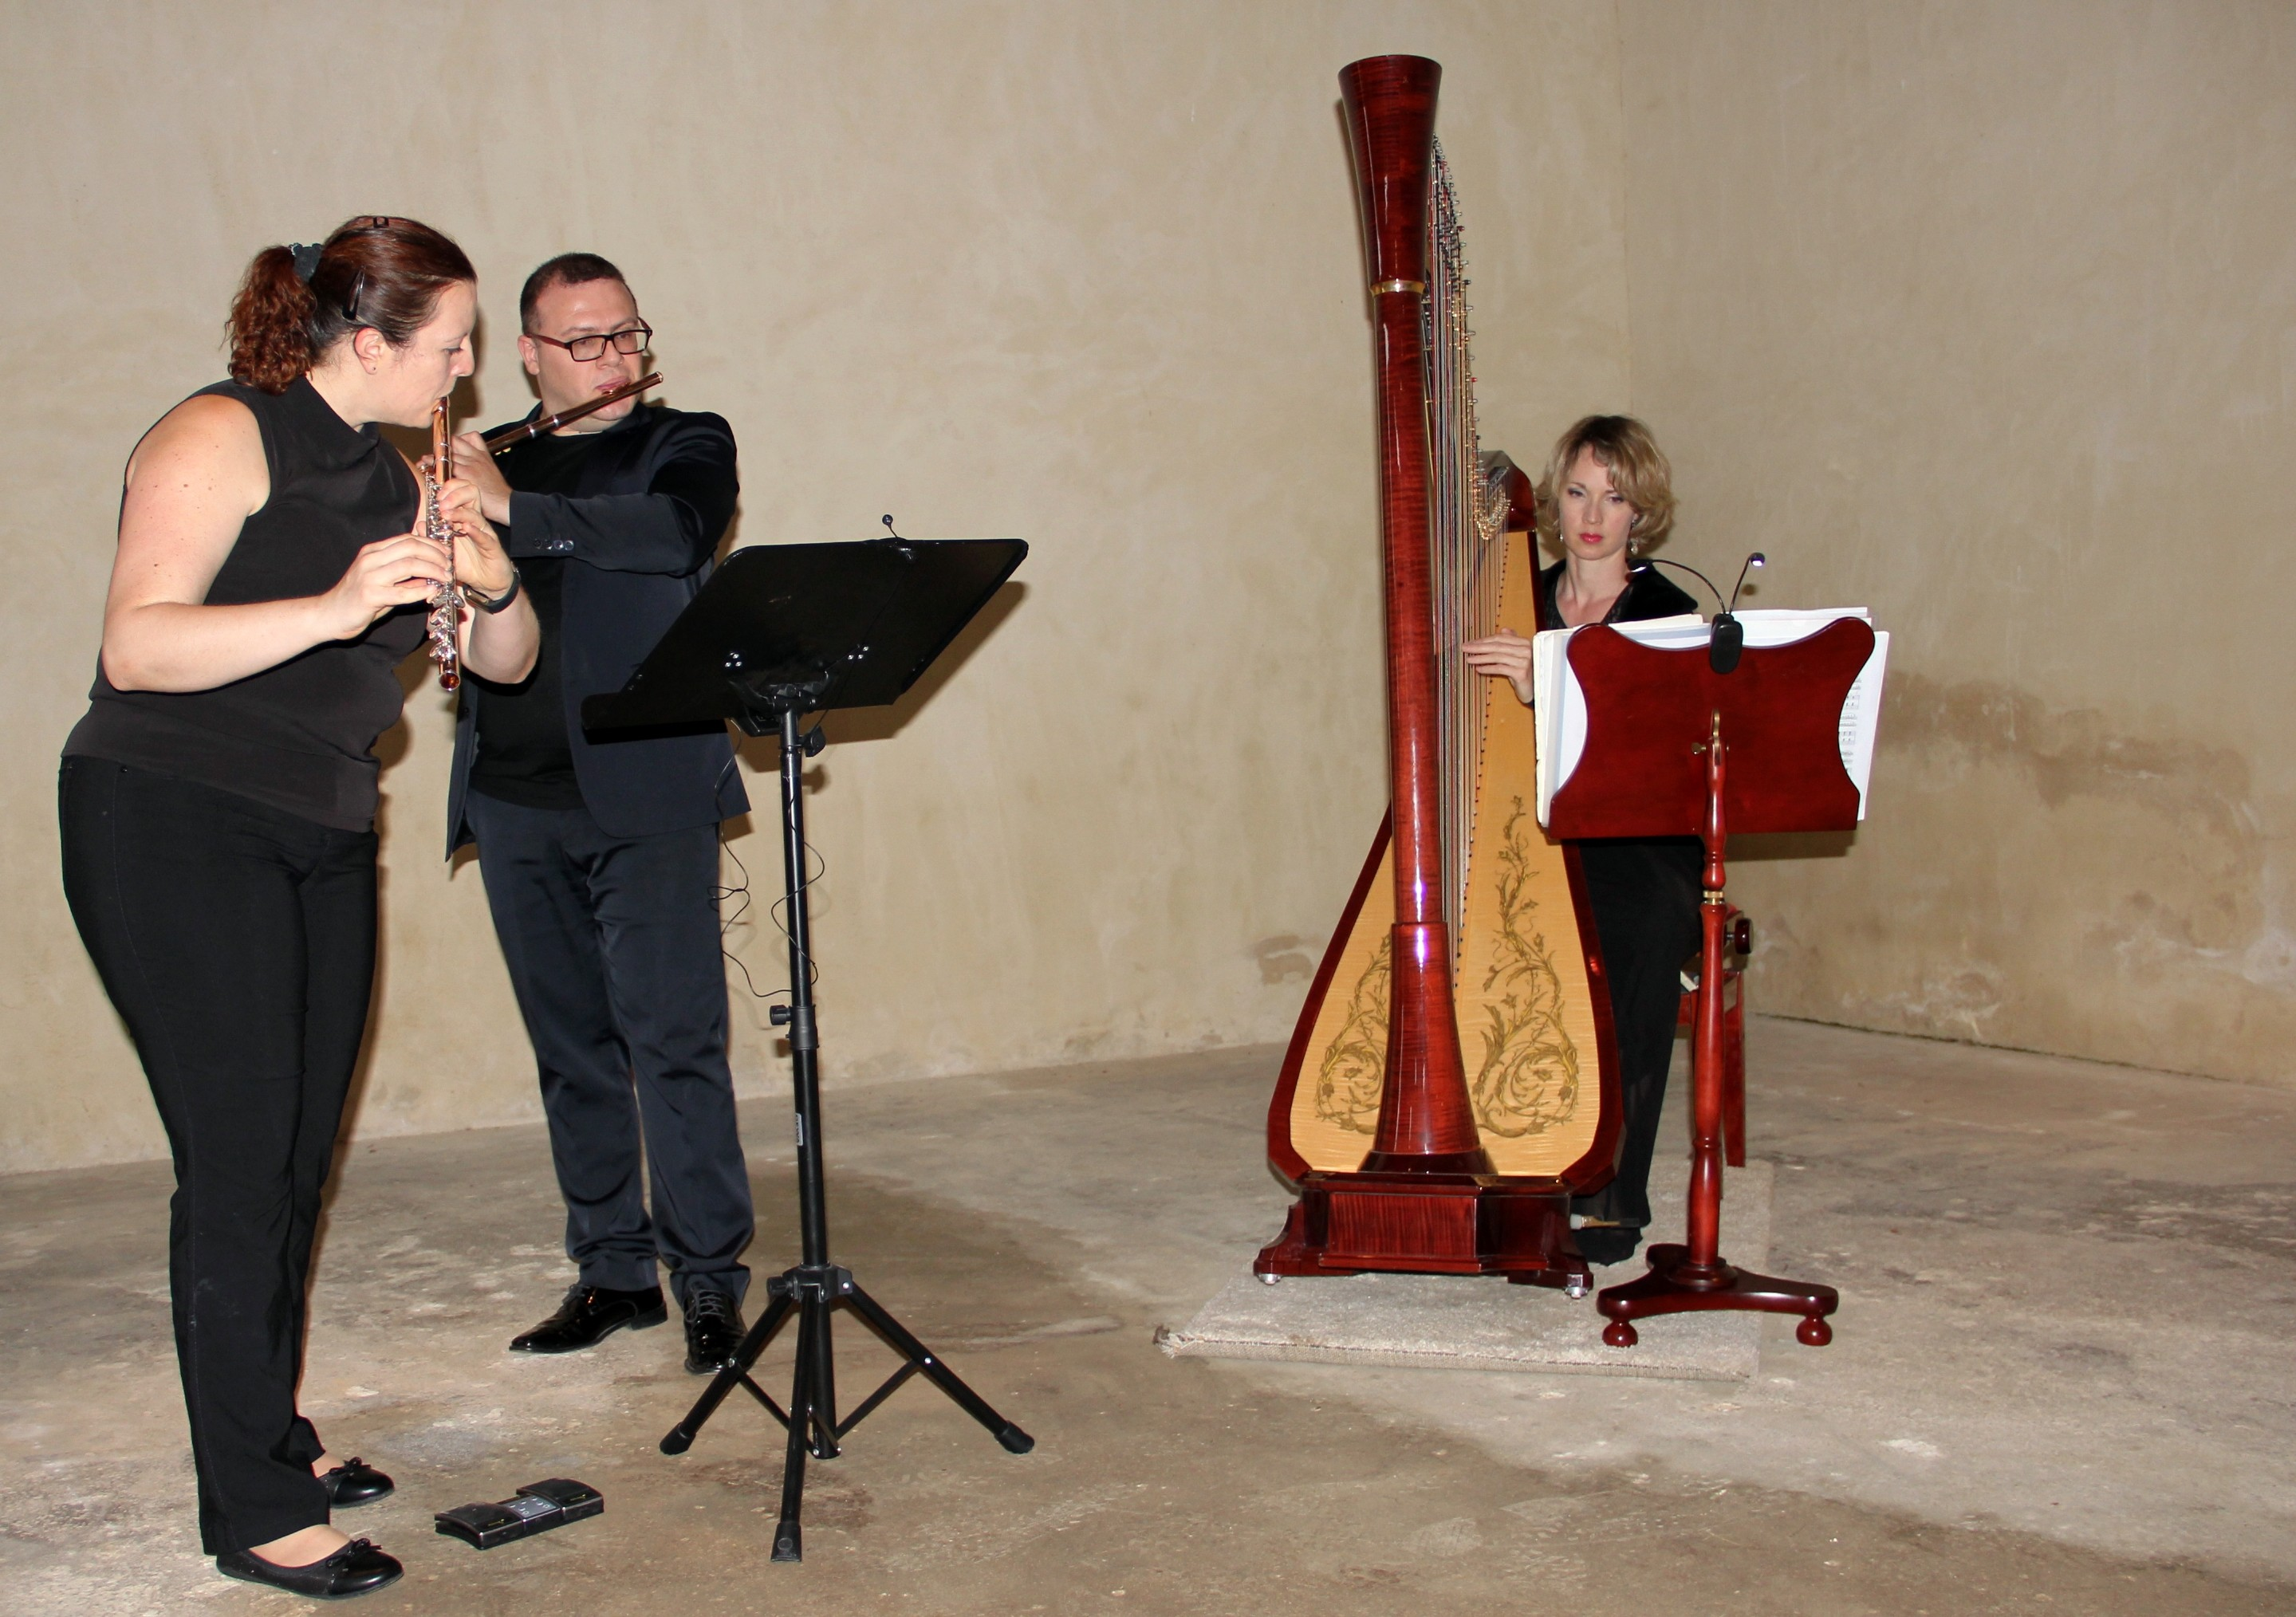 Sandrine Olivier, Raffaele Bifulco, Dorothée Cornec